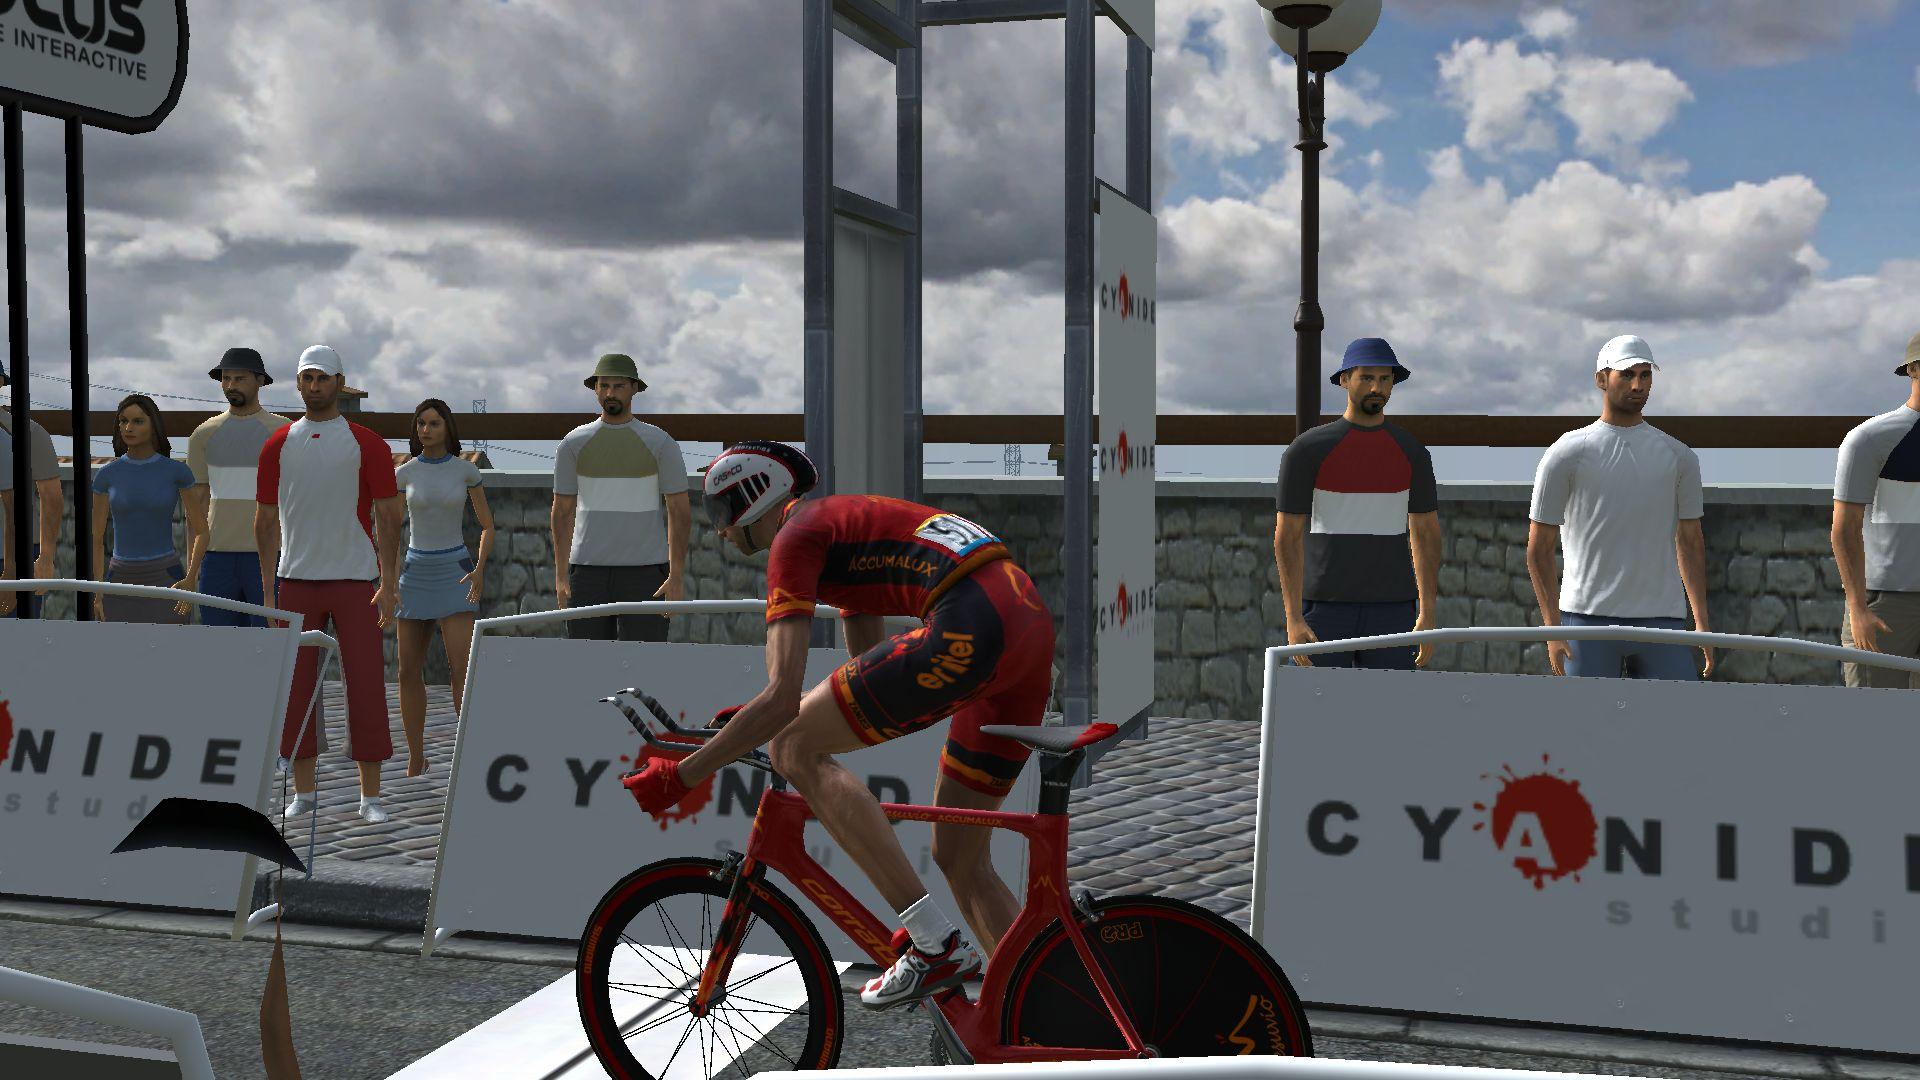 pcmdaily.com/images/mg/2019/Races/GTM/Giro/mg19_giro_09_PCM0055.jpg